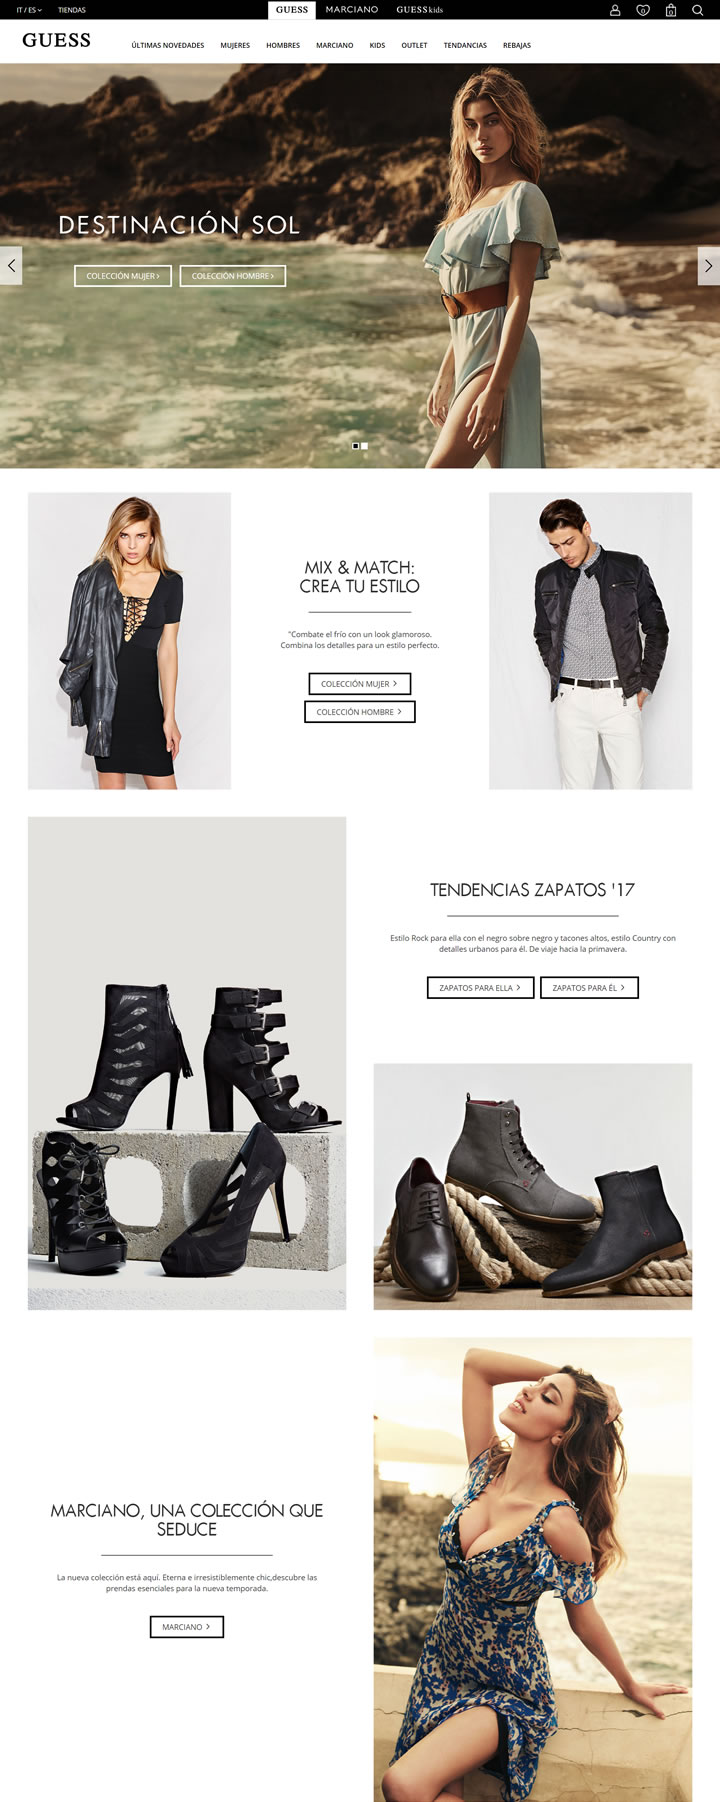 GUESS西班牙官方网上商城:美国服饰品牌